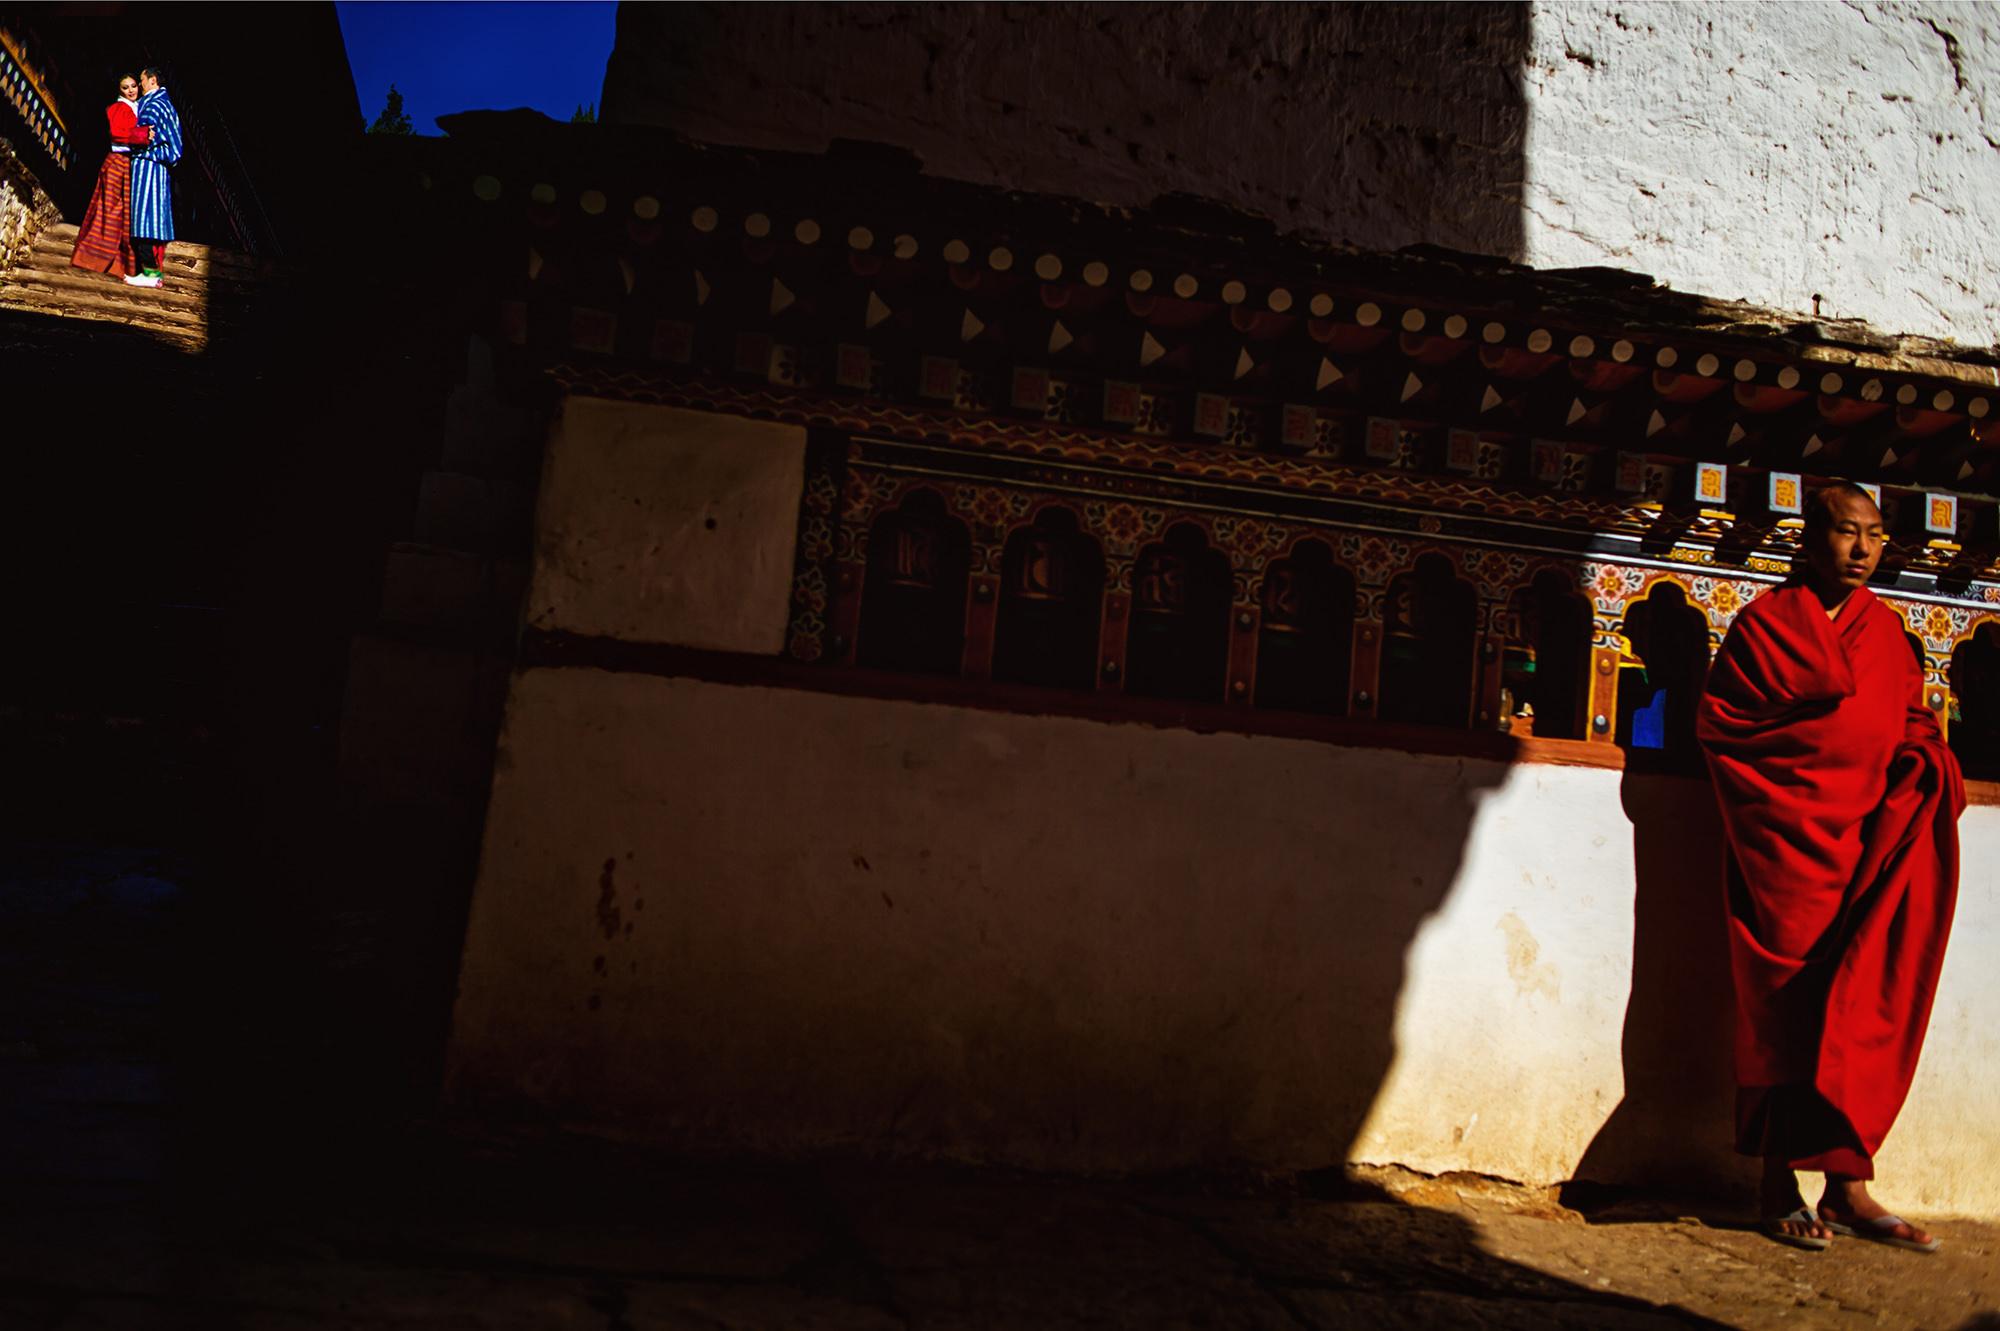 Tibetan monk juxtaposed against couple - Davina + Daniel